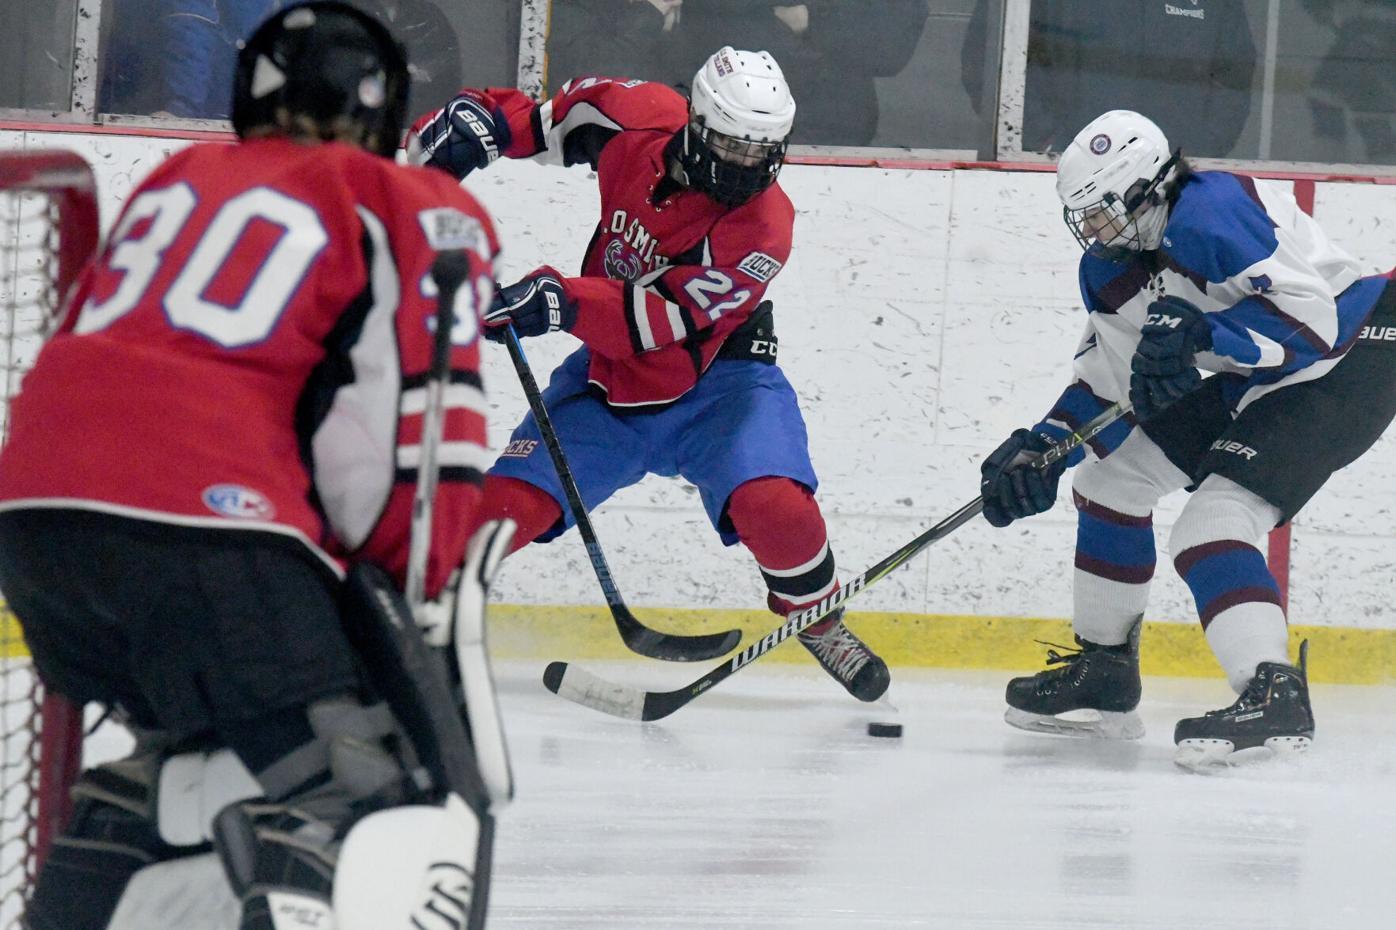 031721 EO SU Boys Hockey 01.jpg